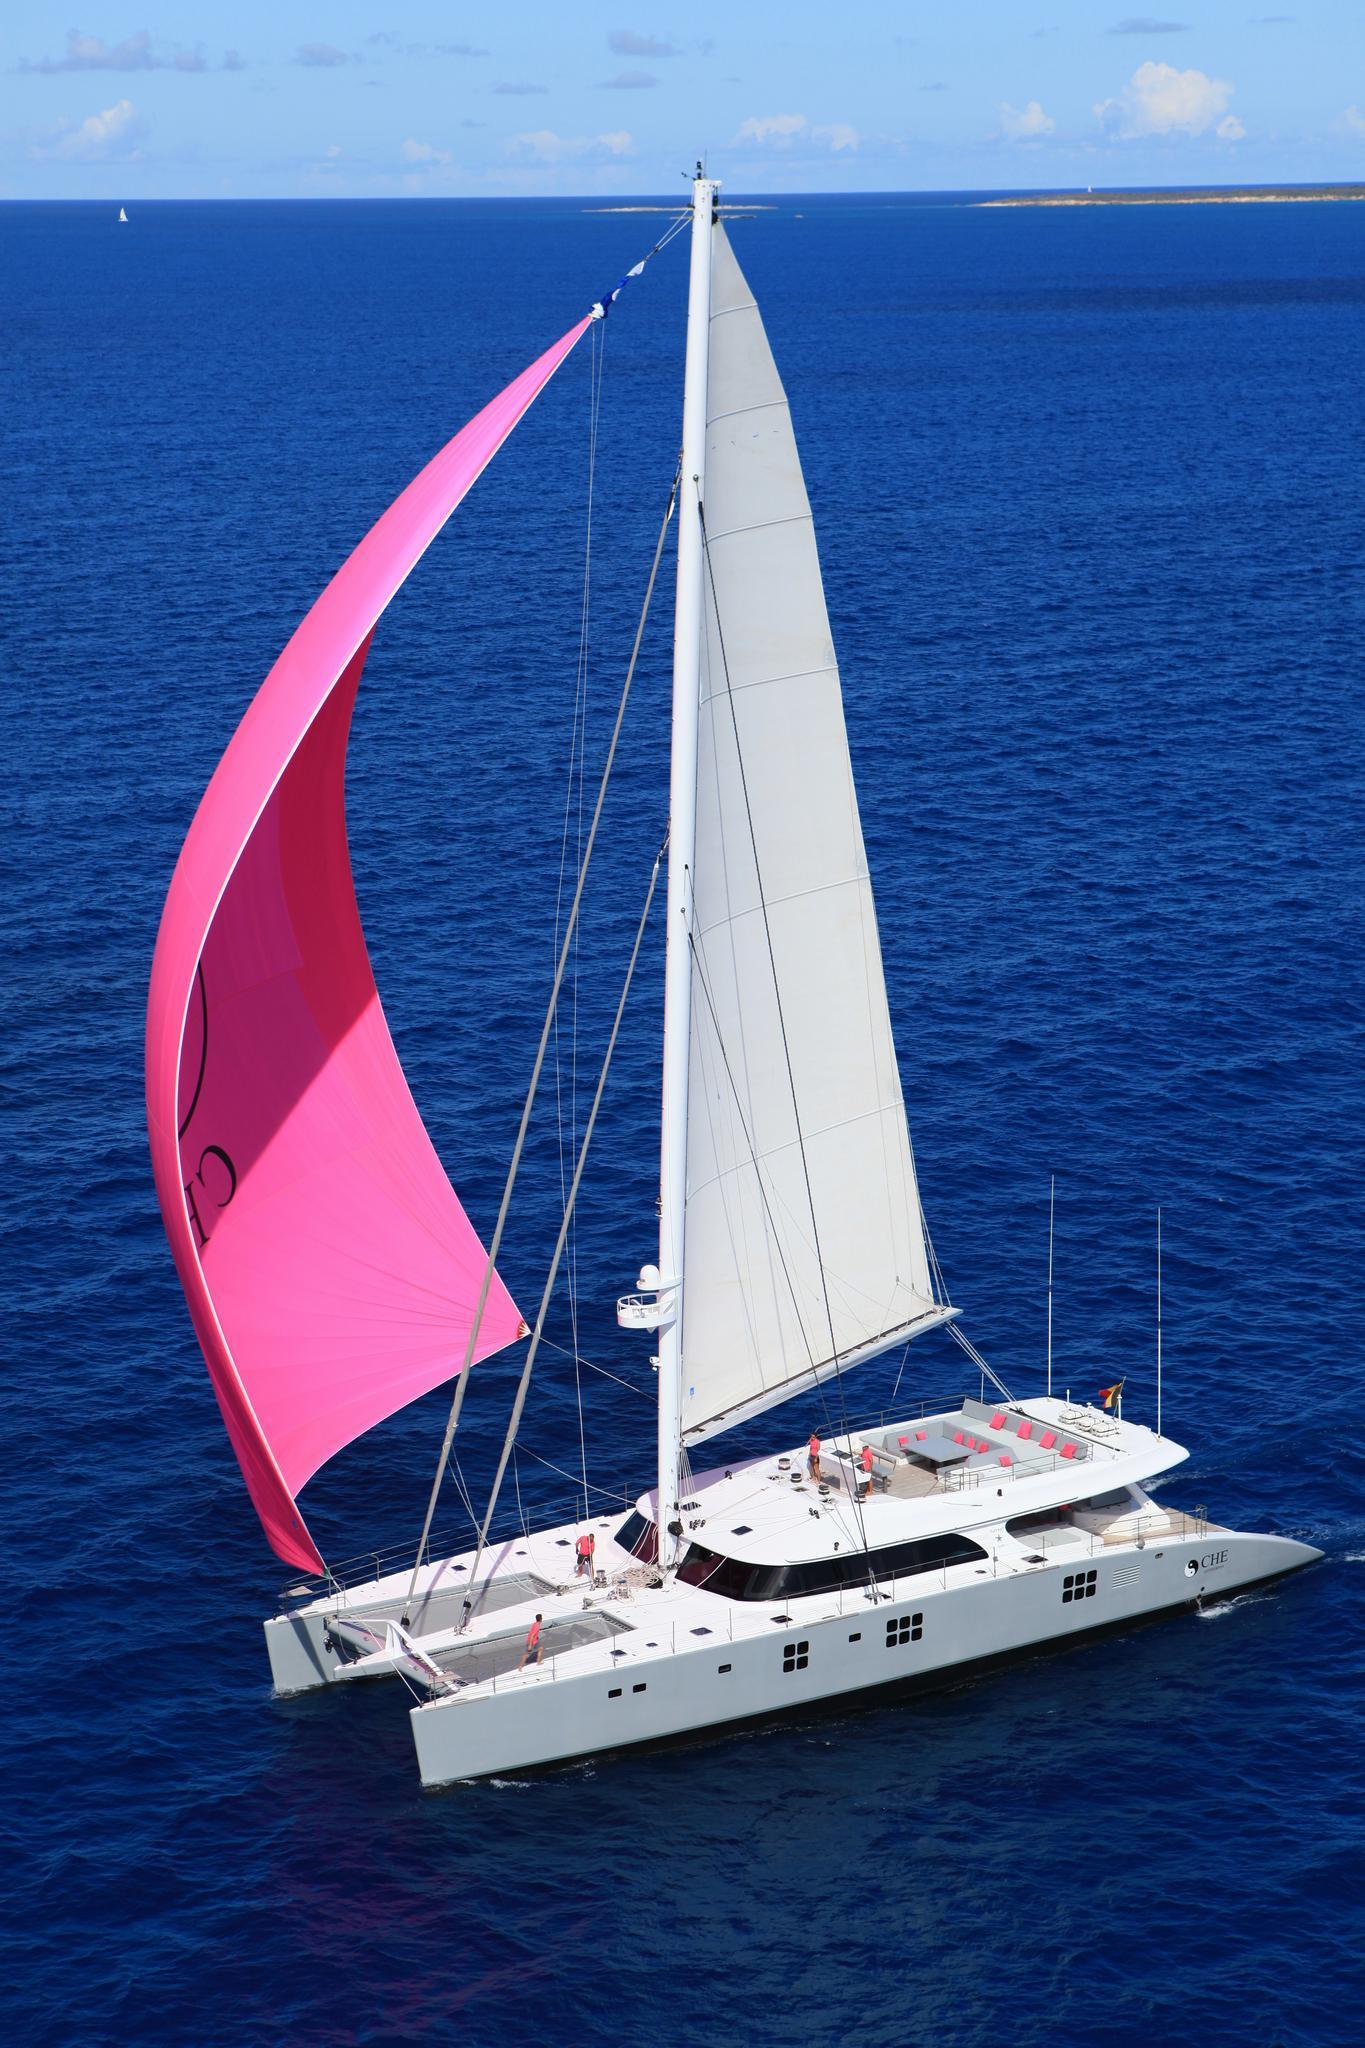 Sailing yacht catamaran